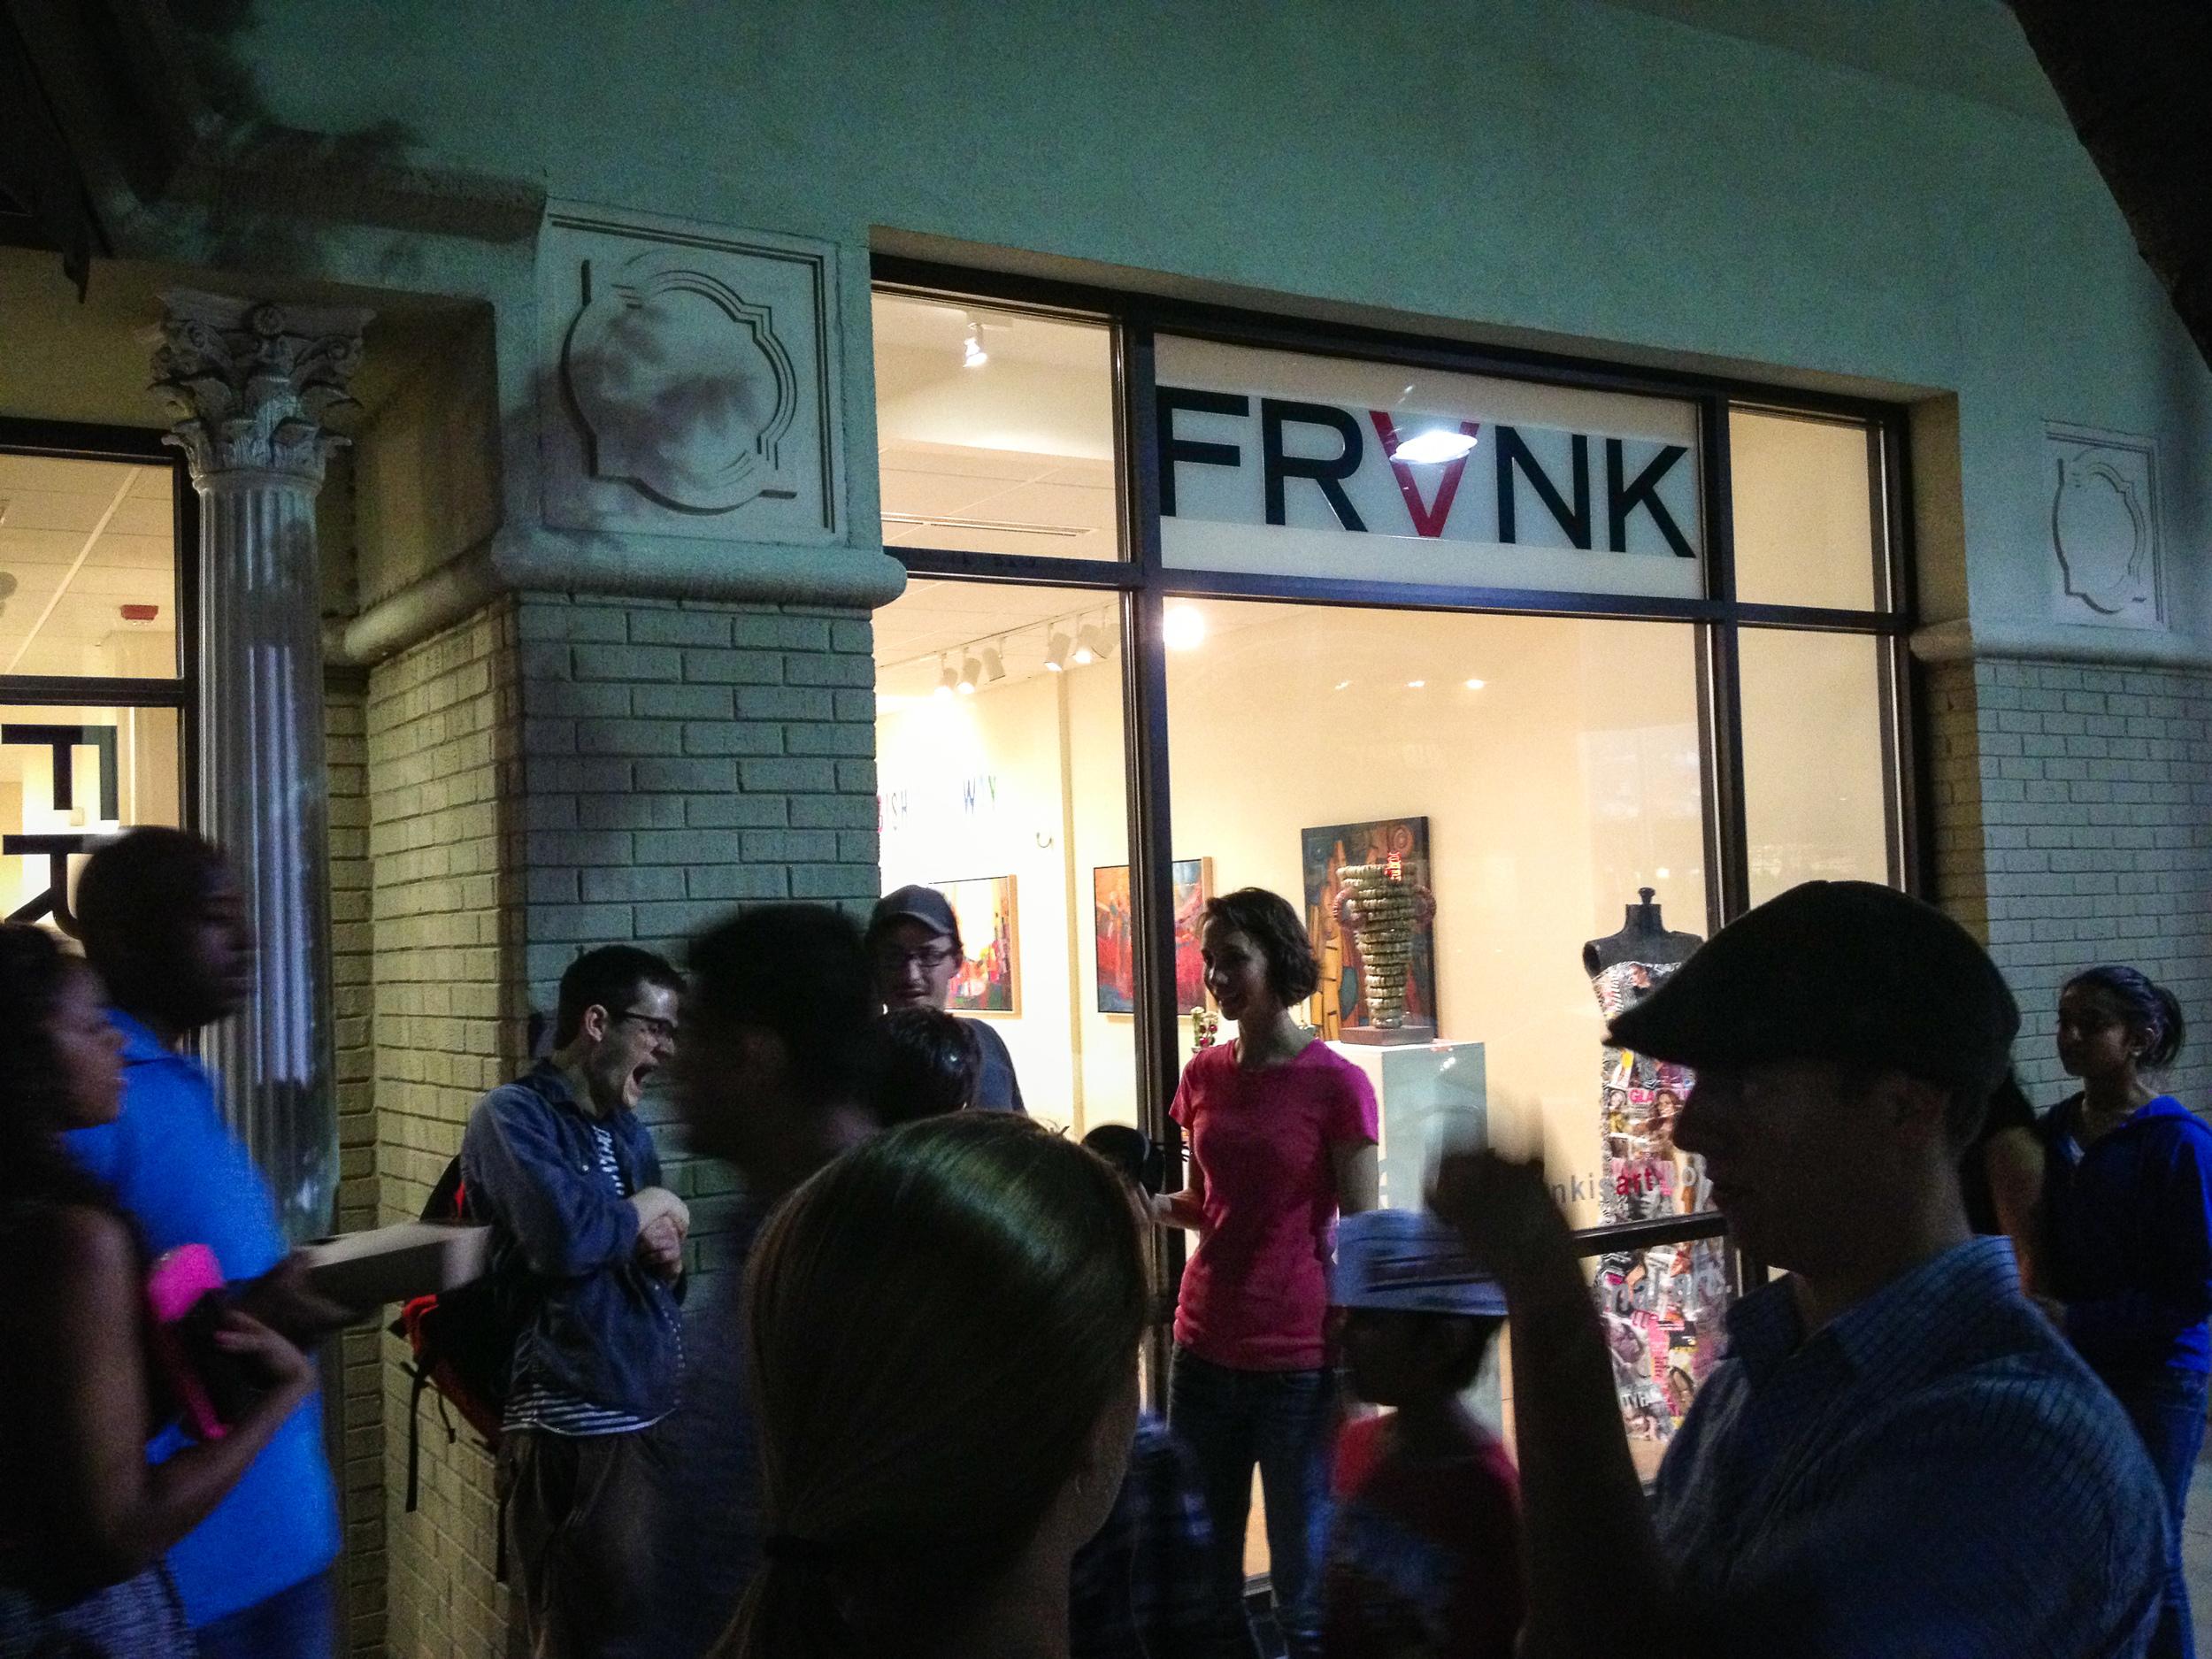 Nightlife on Franklin Street